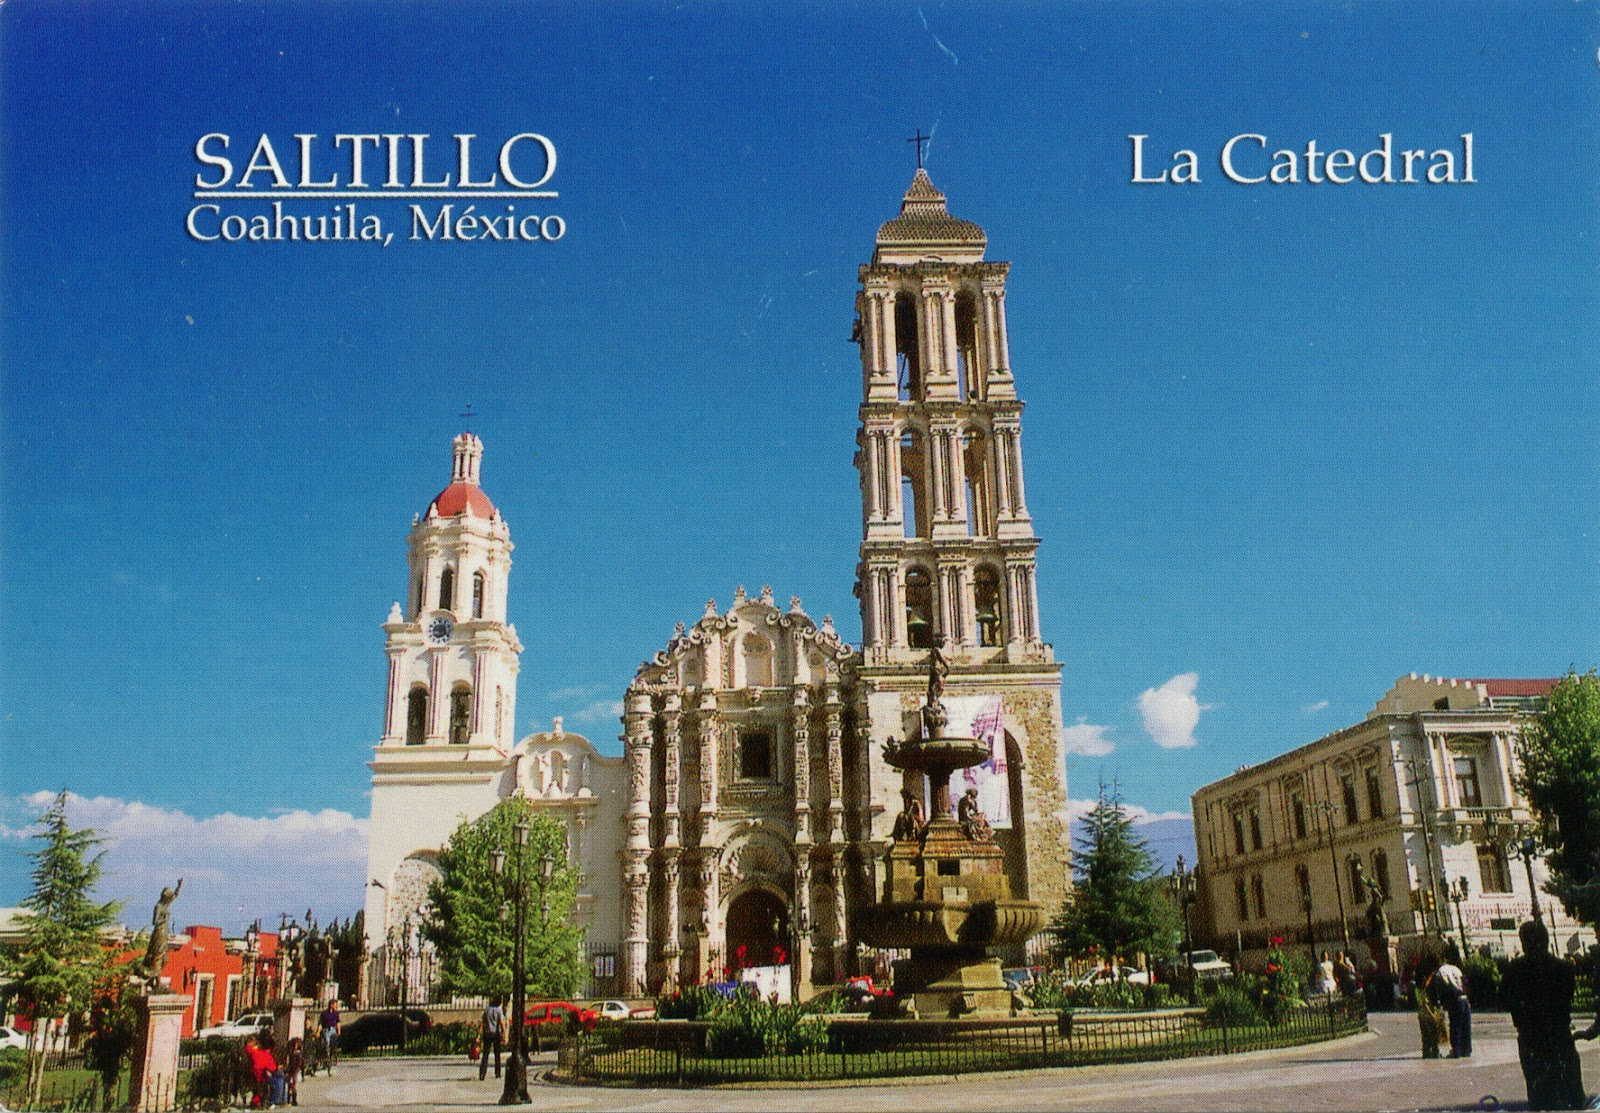 Saltillo Coahuila Mexico